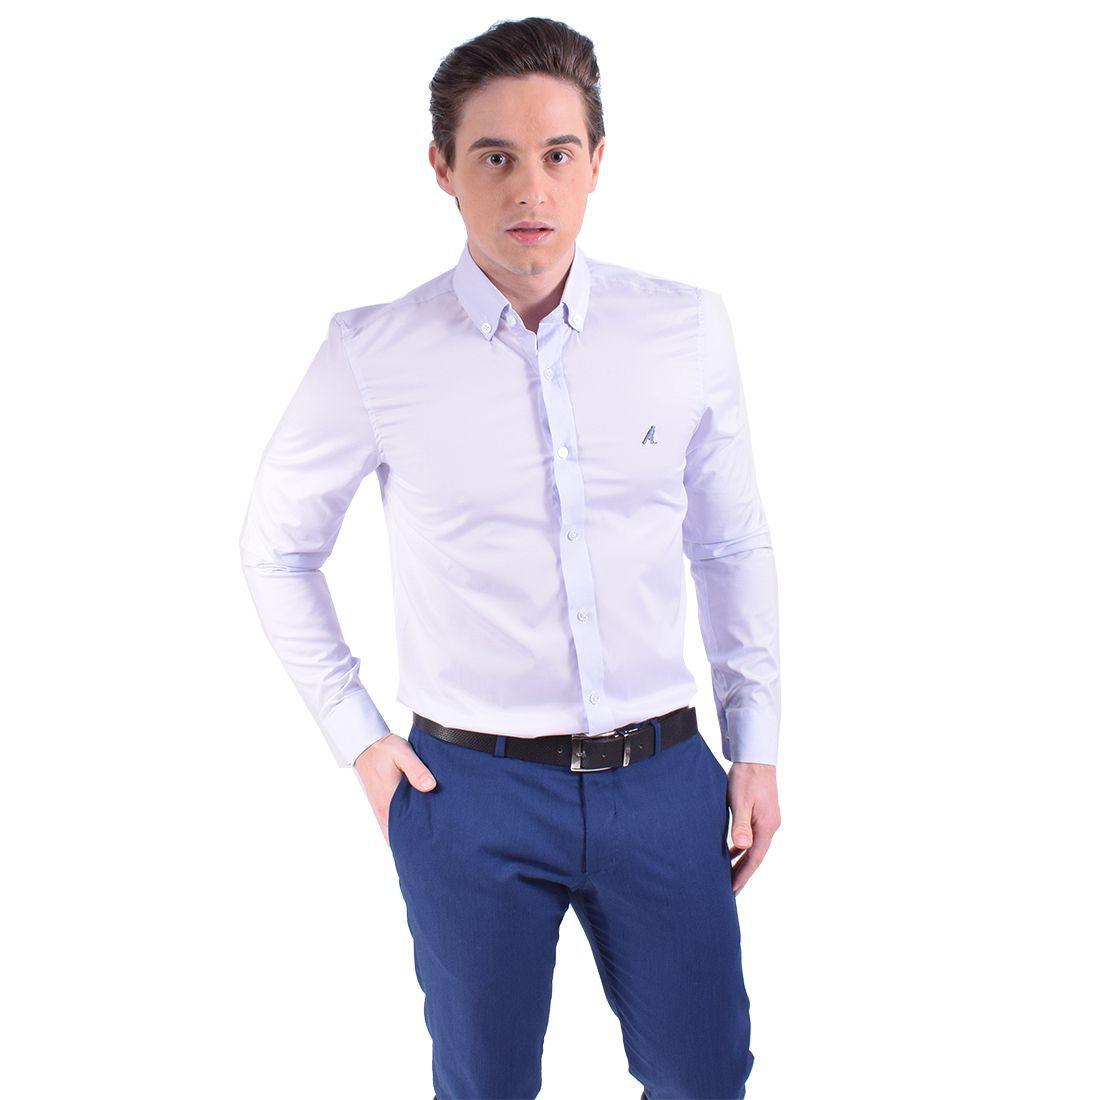 100208 - Camisa Social Masculina Slim Azul Bebe - LEVOK